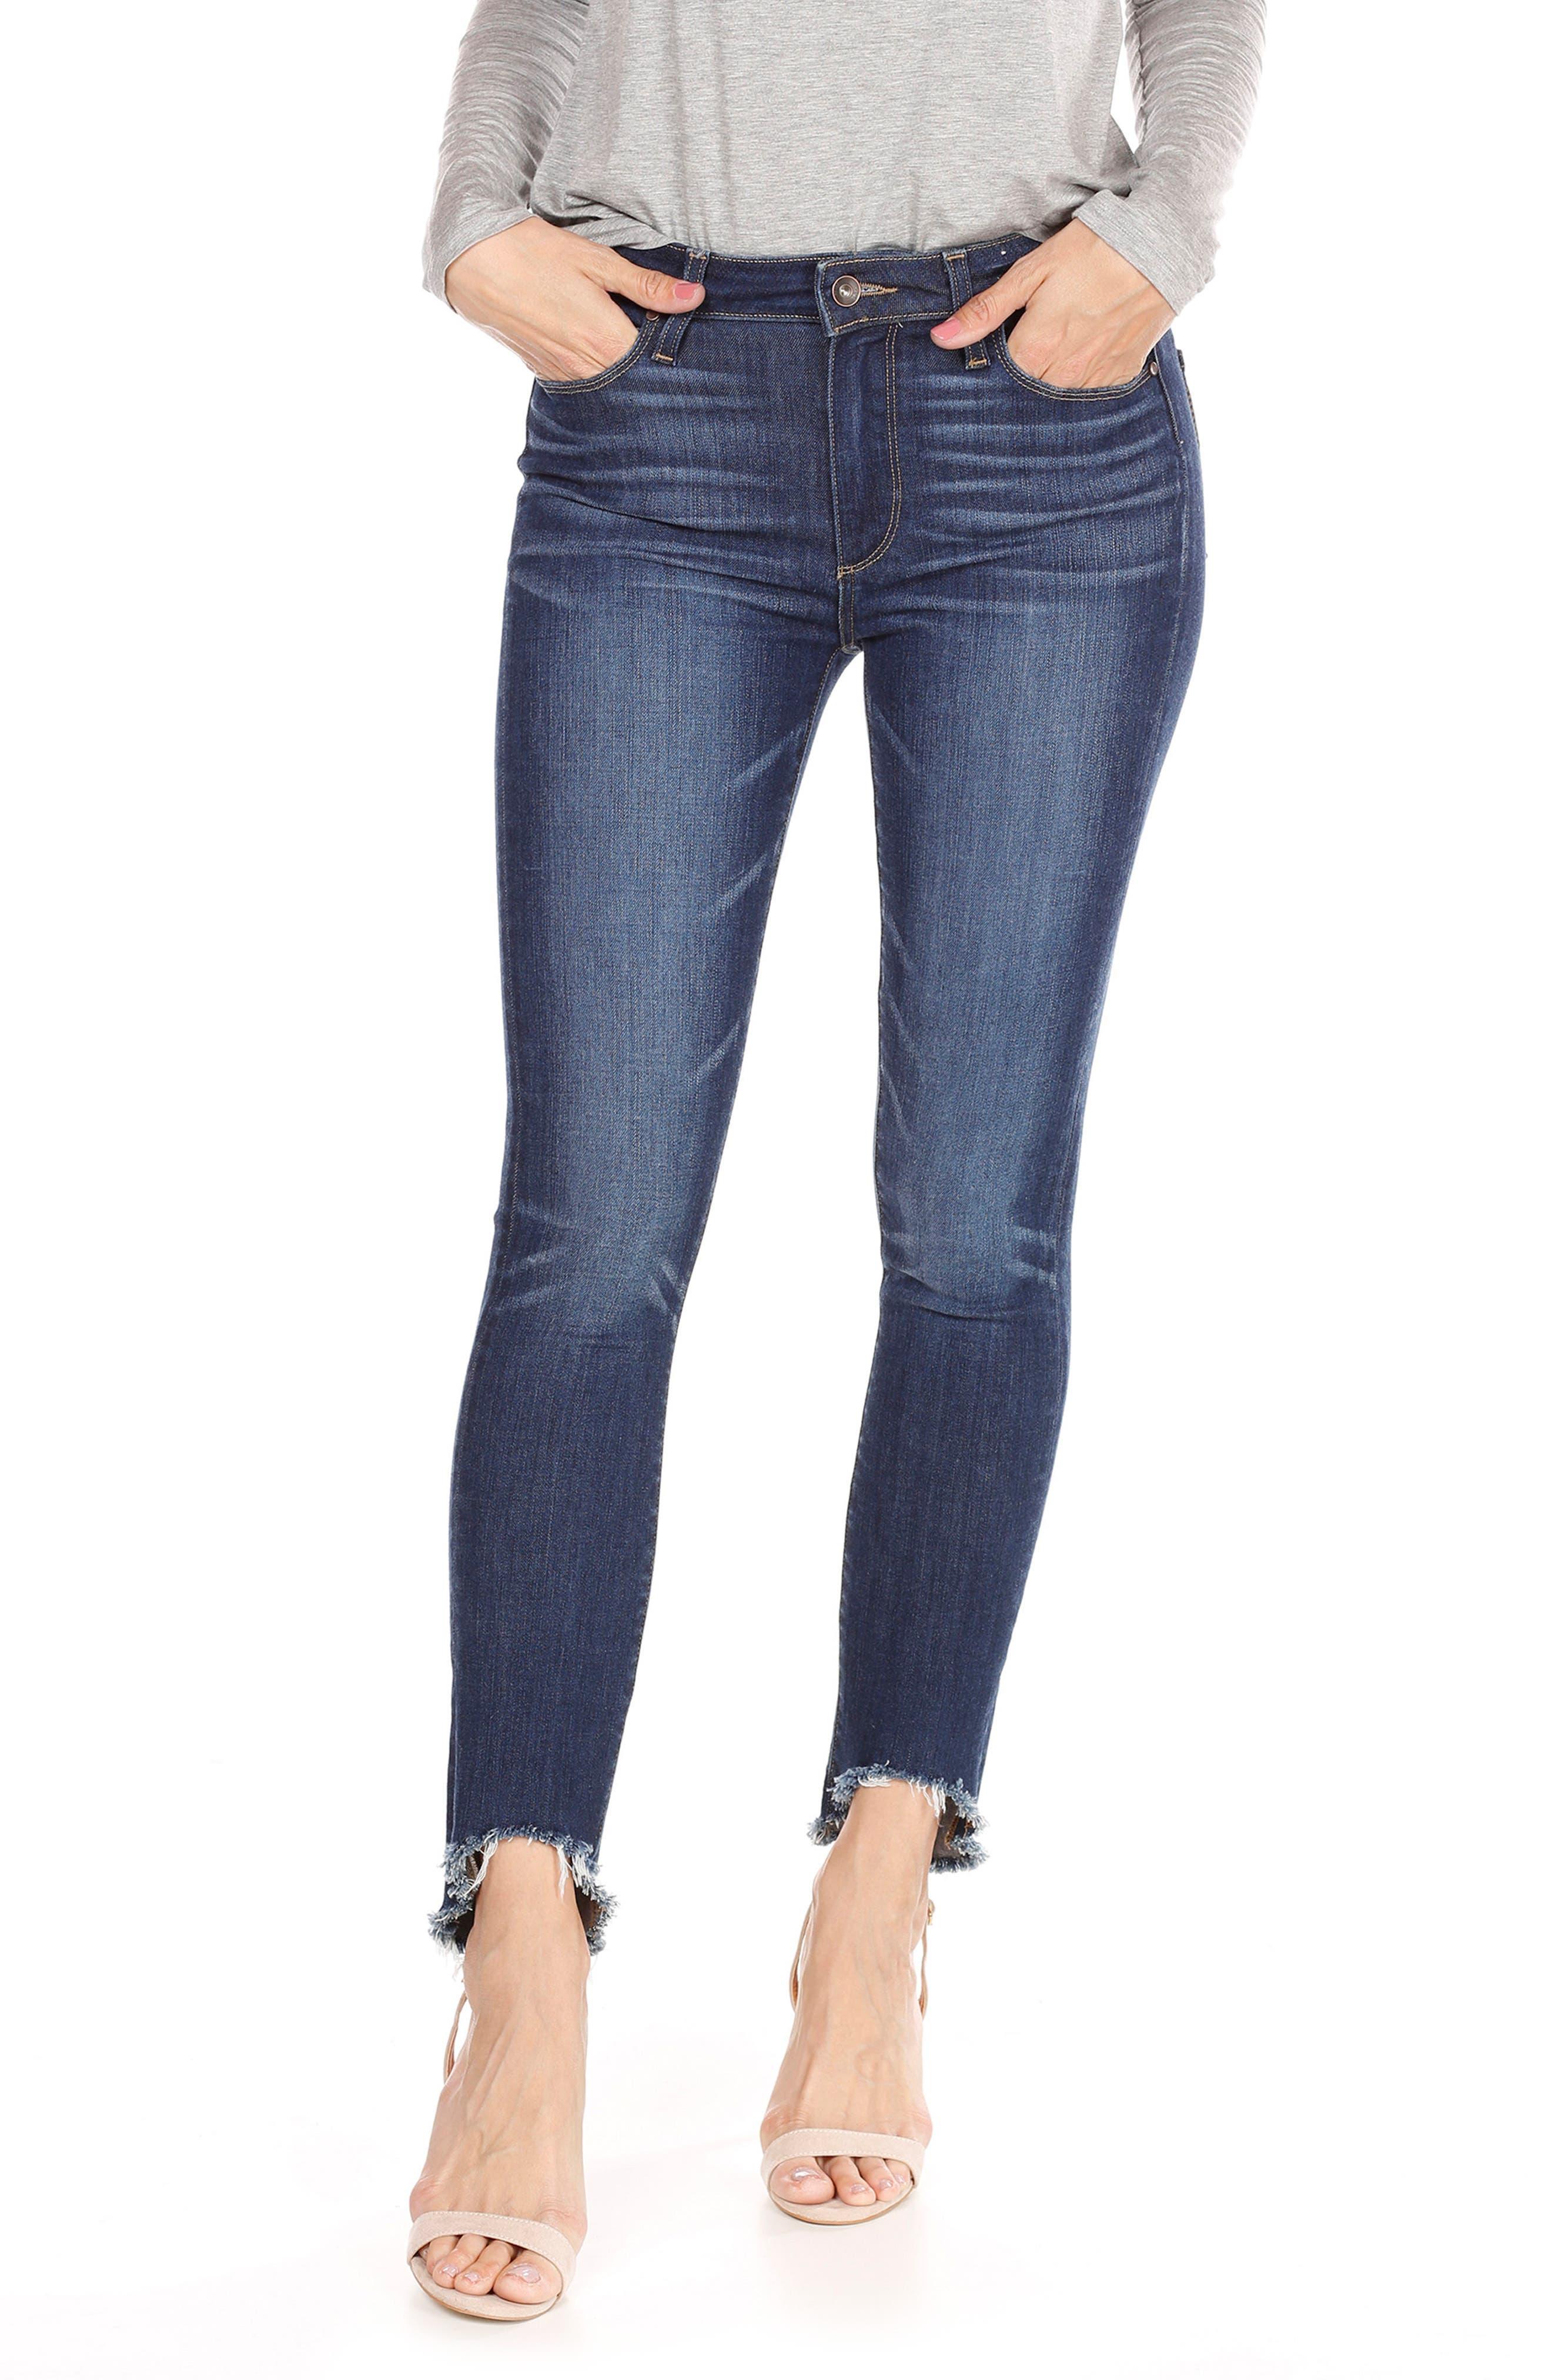 Main Image - PAIGE Transcend Vintage - Hoxton High Waist Ankle Skinny Jeans (Auburn) (Petite)